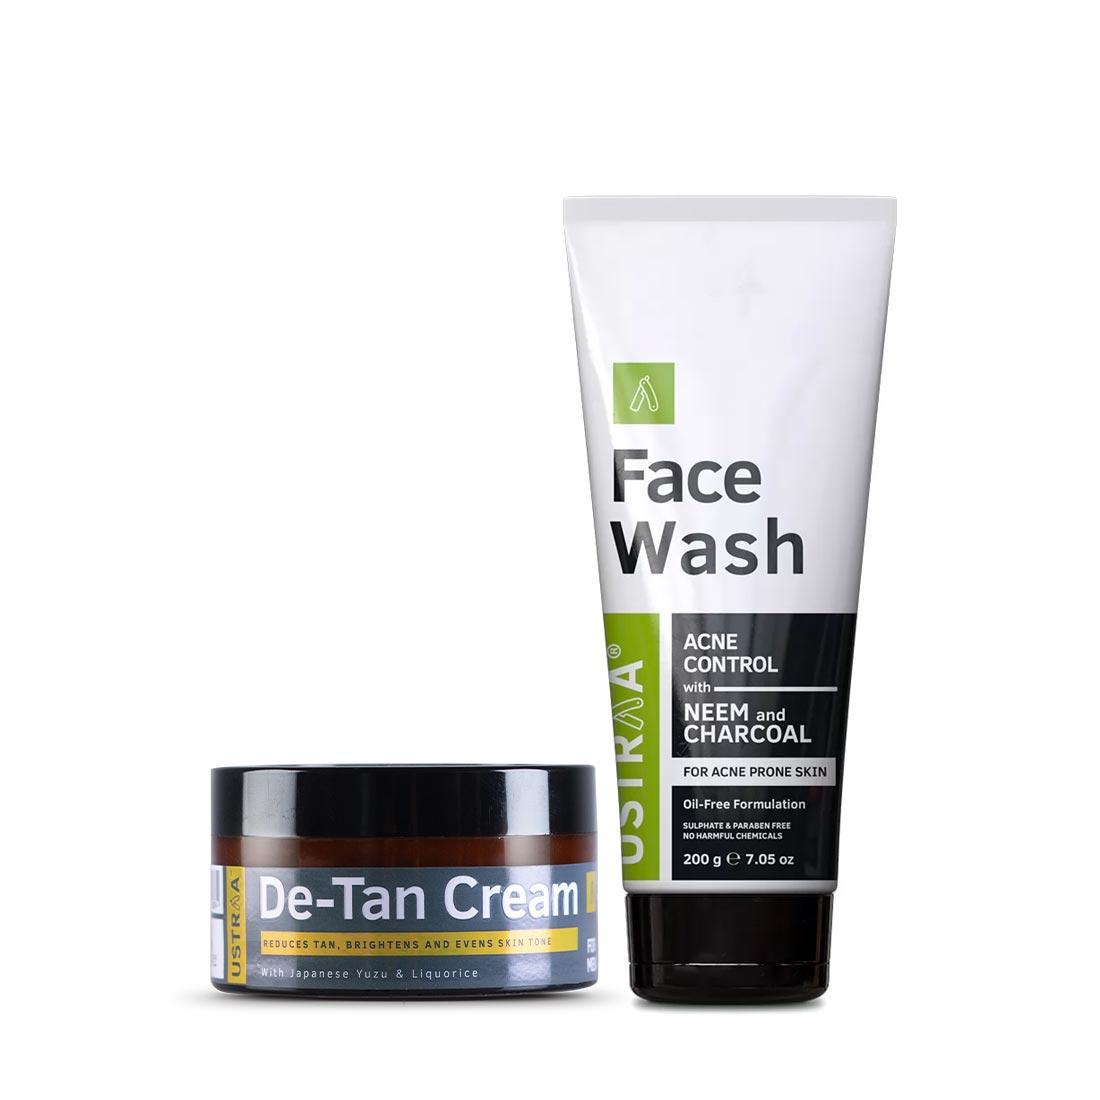 Ustraa | Ustraa De tan Cream 50 g and Face Wash (Neem & Charcoal) 200g